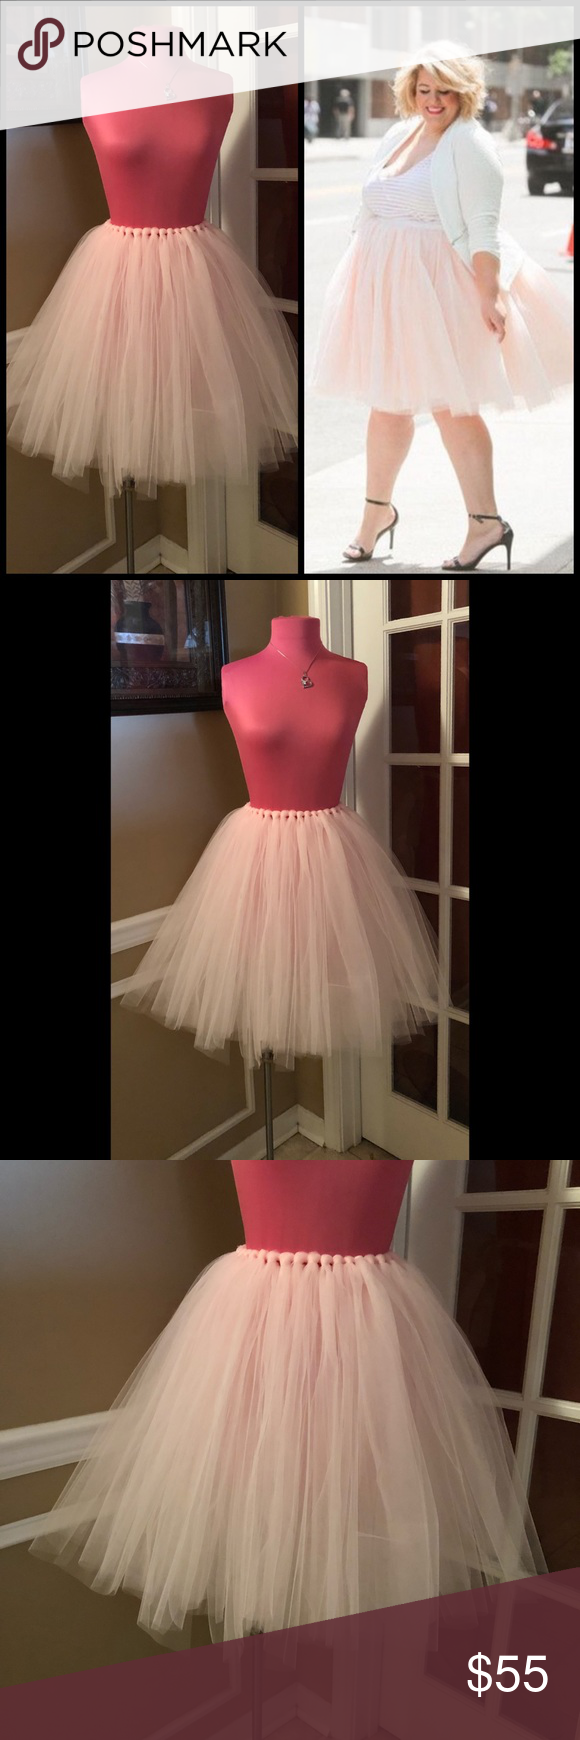 •Custom• Ballerina Pink Tutu Skirt Boutique Pink tutu